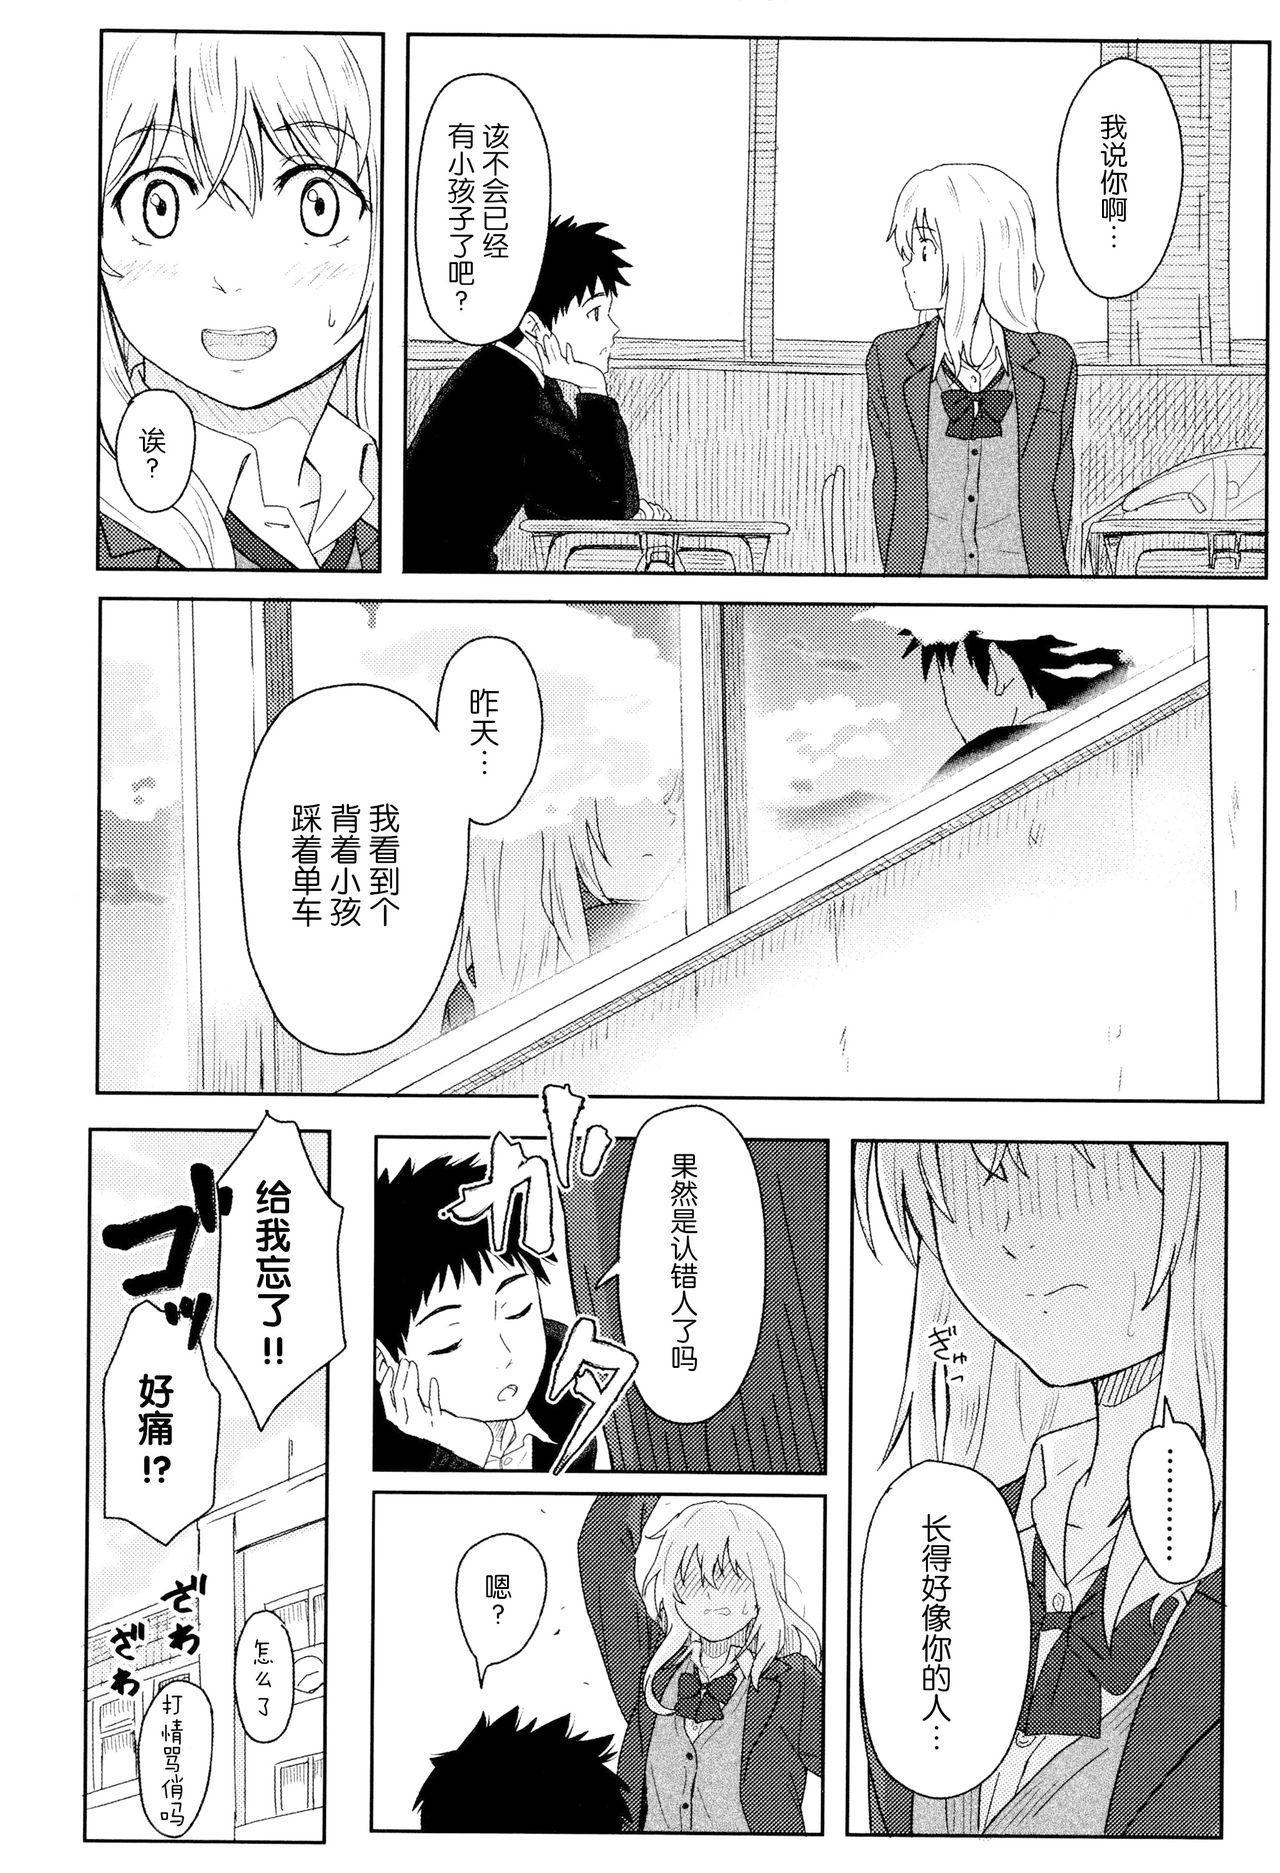 Tokubetsu na Mainichi - Special daily 10